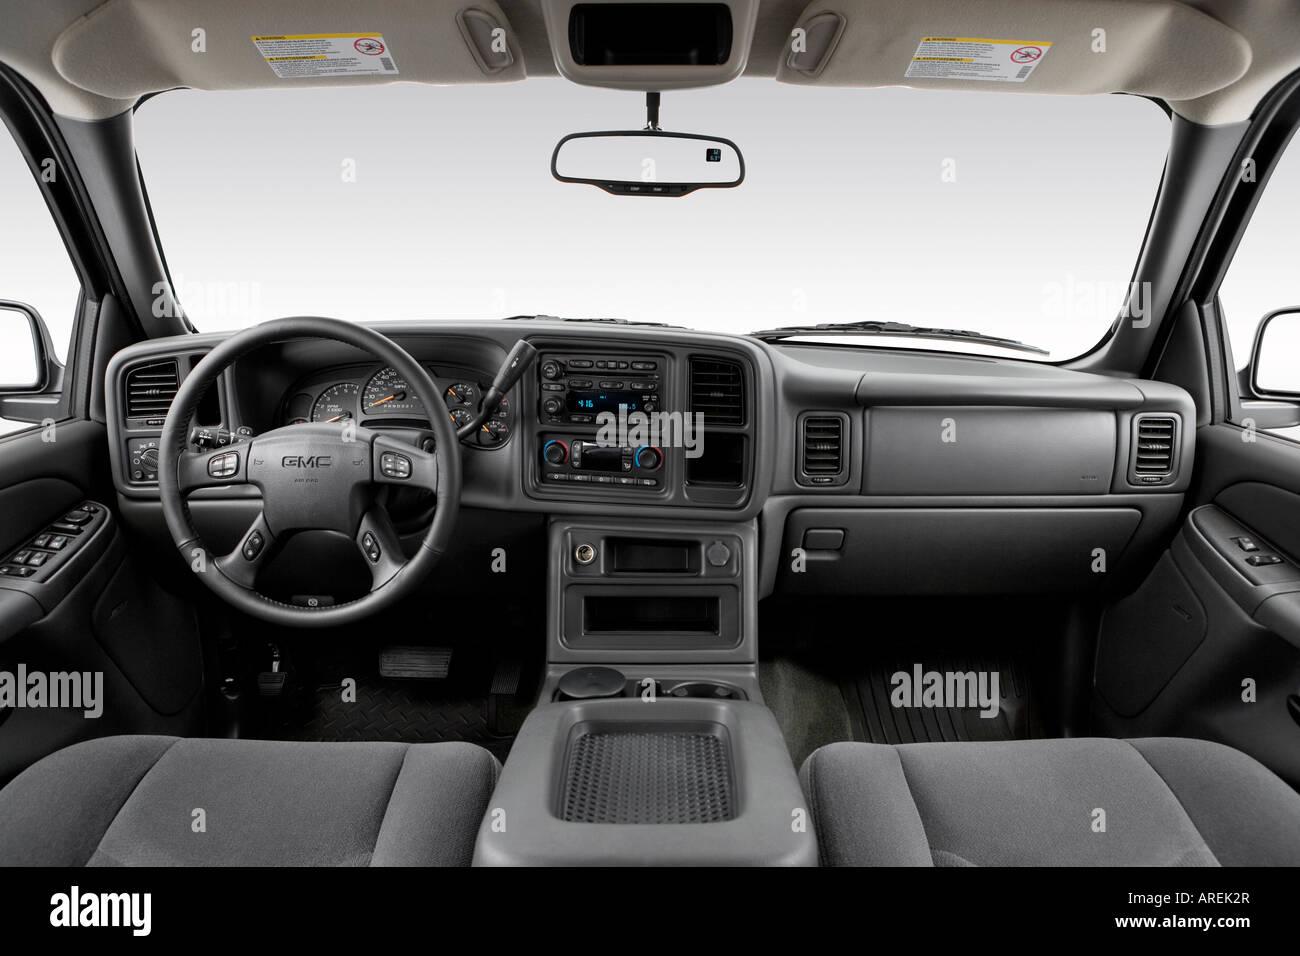 2006 Chevrolet Silverado 1500 Crew Cab >> 2006 GMC Sierra 1500 HD SLE in White - Dashboard, center ...